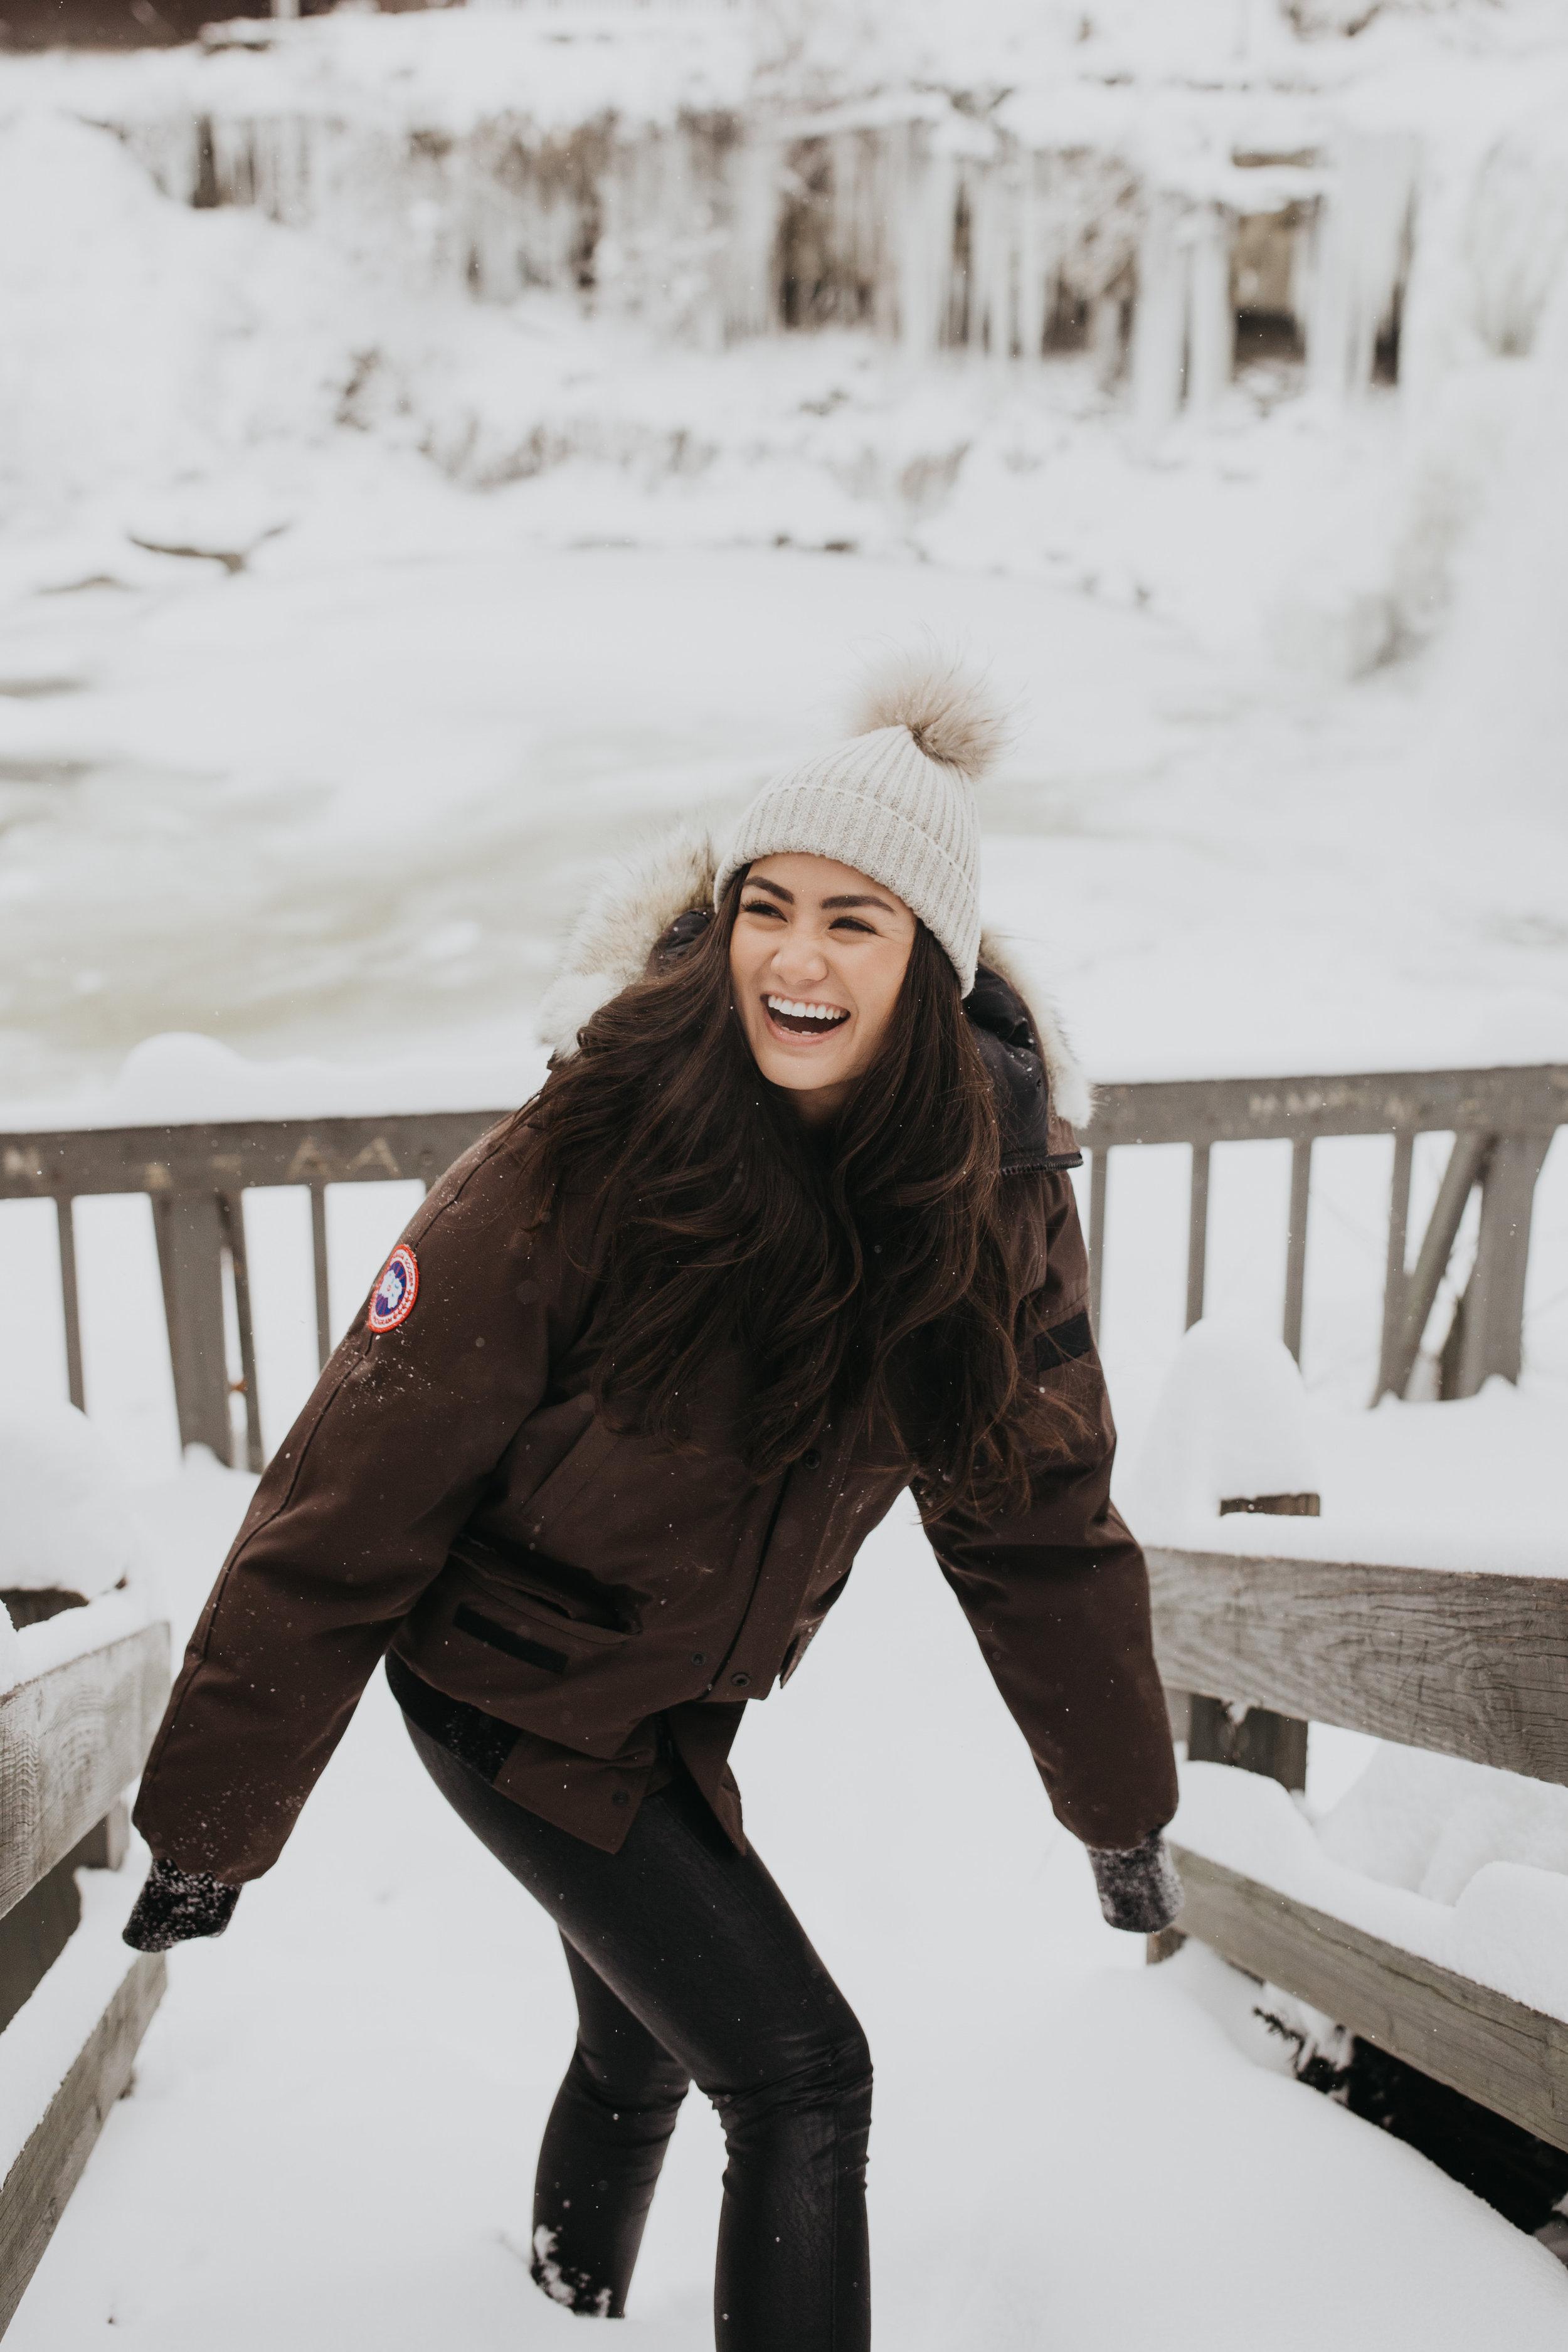 Caila Quinn The Bachelor Brown Canada Goose Coat Chagrin Falls Ohio